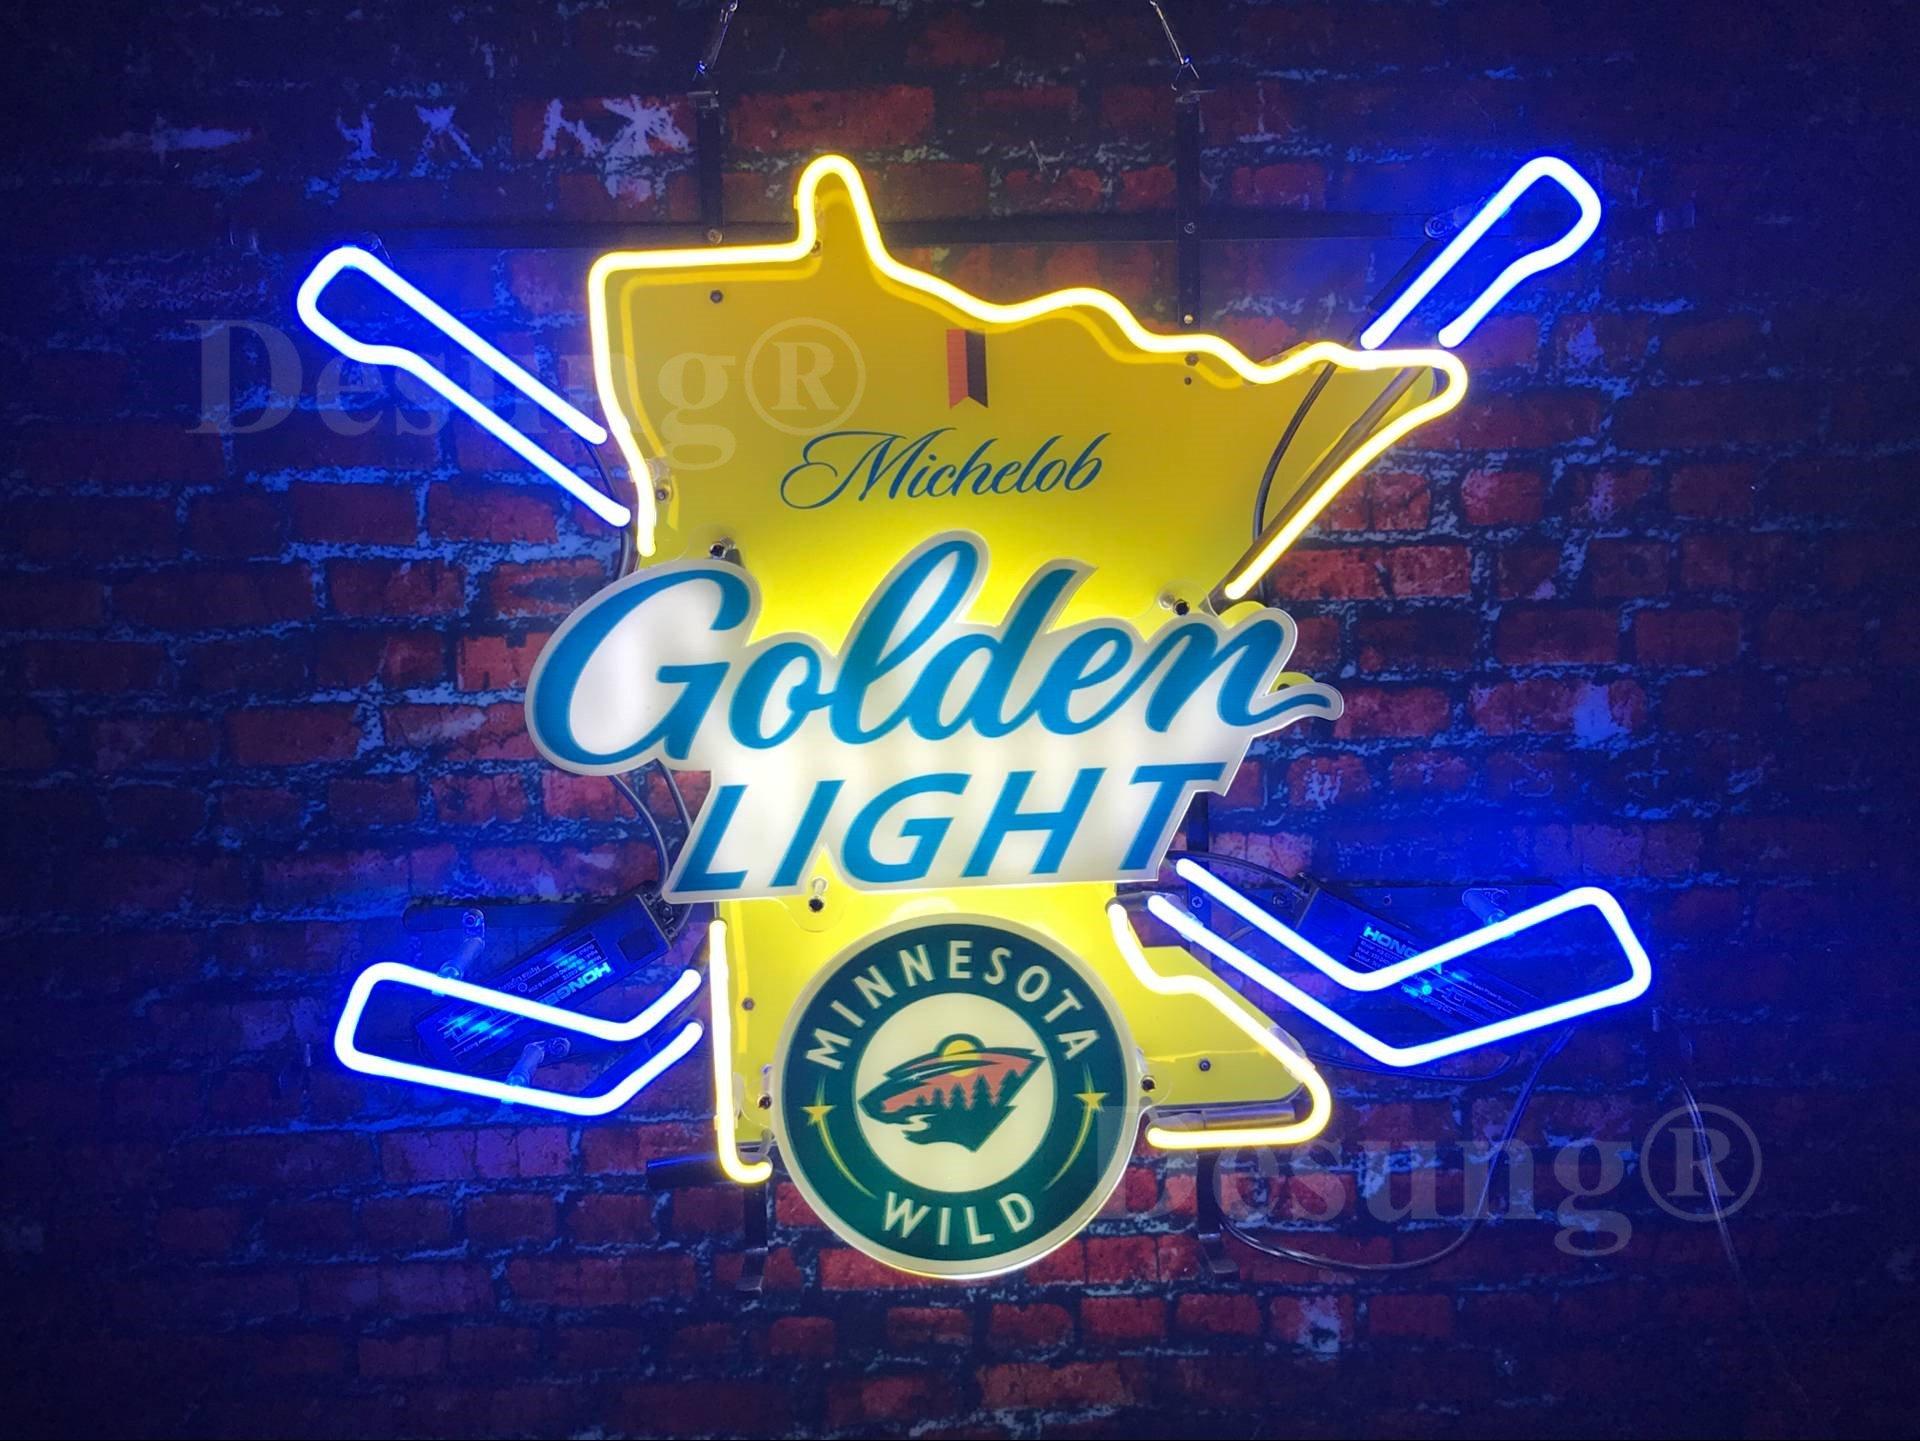 Desung New 24''x20'' Sports MW Team G olden Light Neon Sign Man Cave Signs Sports Bar Pub Beer Neon Lights Lamp Glass Neon Light DX16